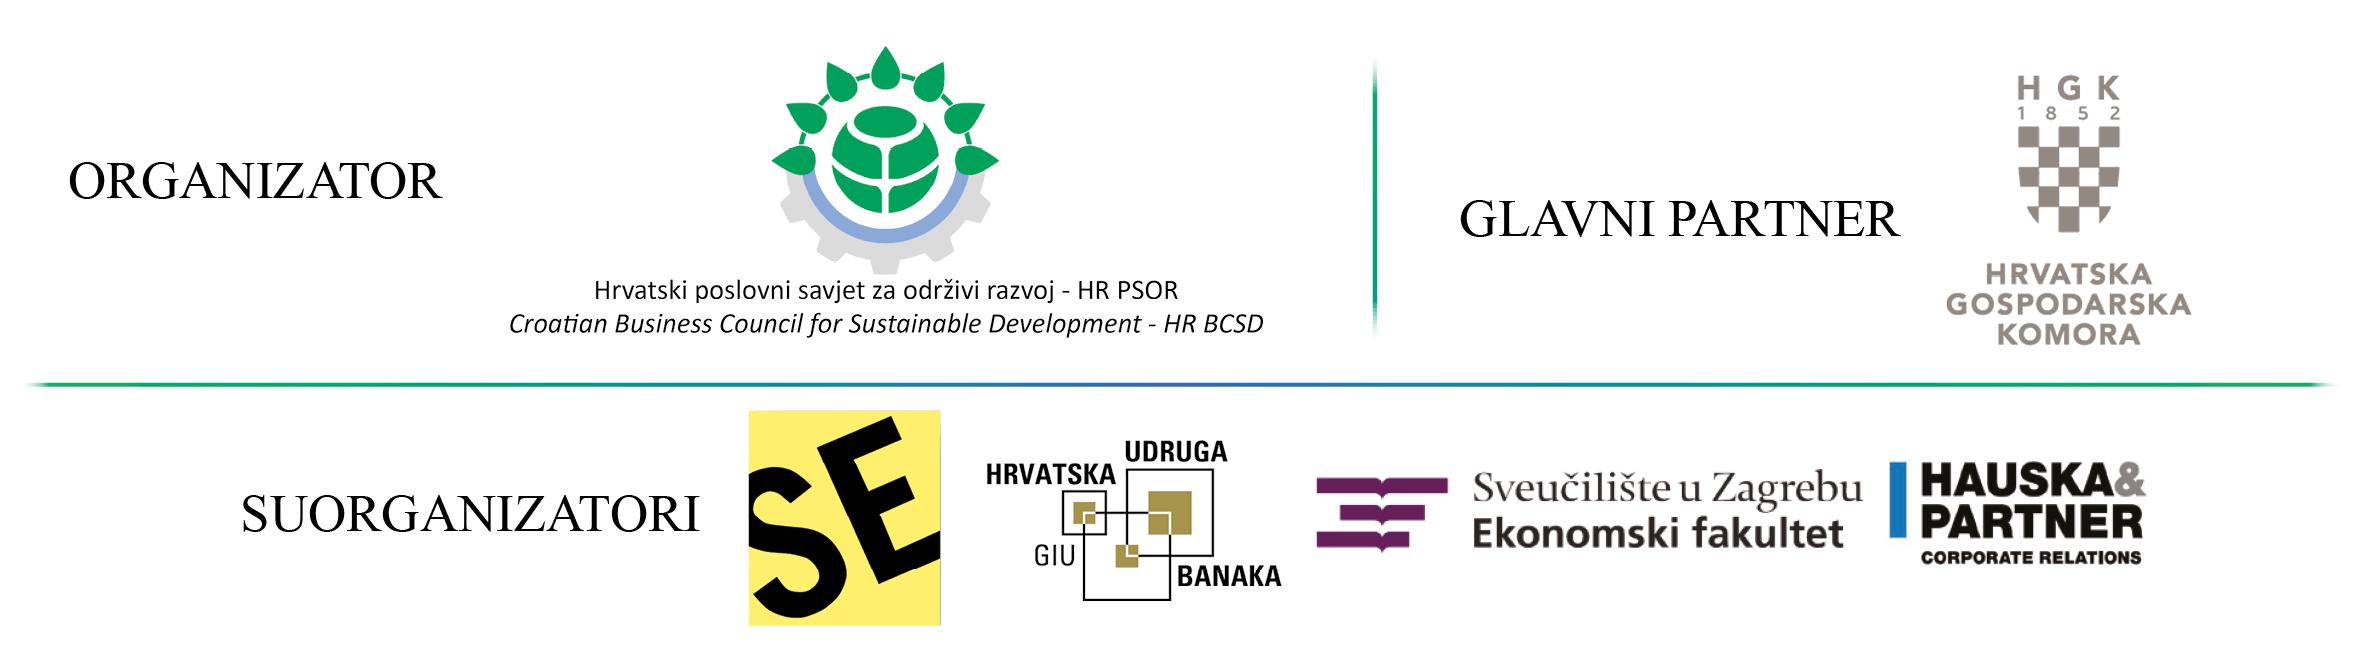 12. konferencija o DOP-u i 13. dodjela nagrada Indeksa DOP-a 11 - hrpsor Hrvatski poslovni savjet za održivi razvoj